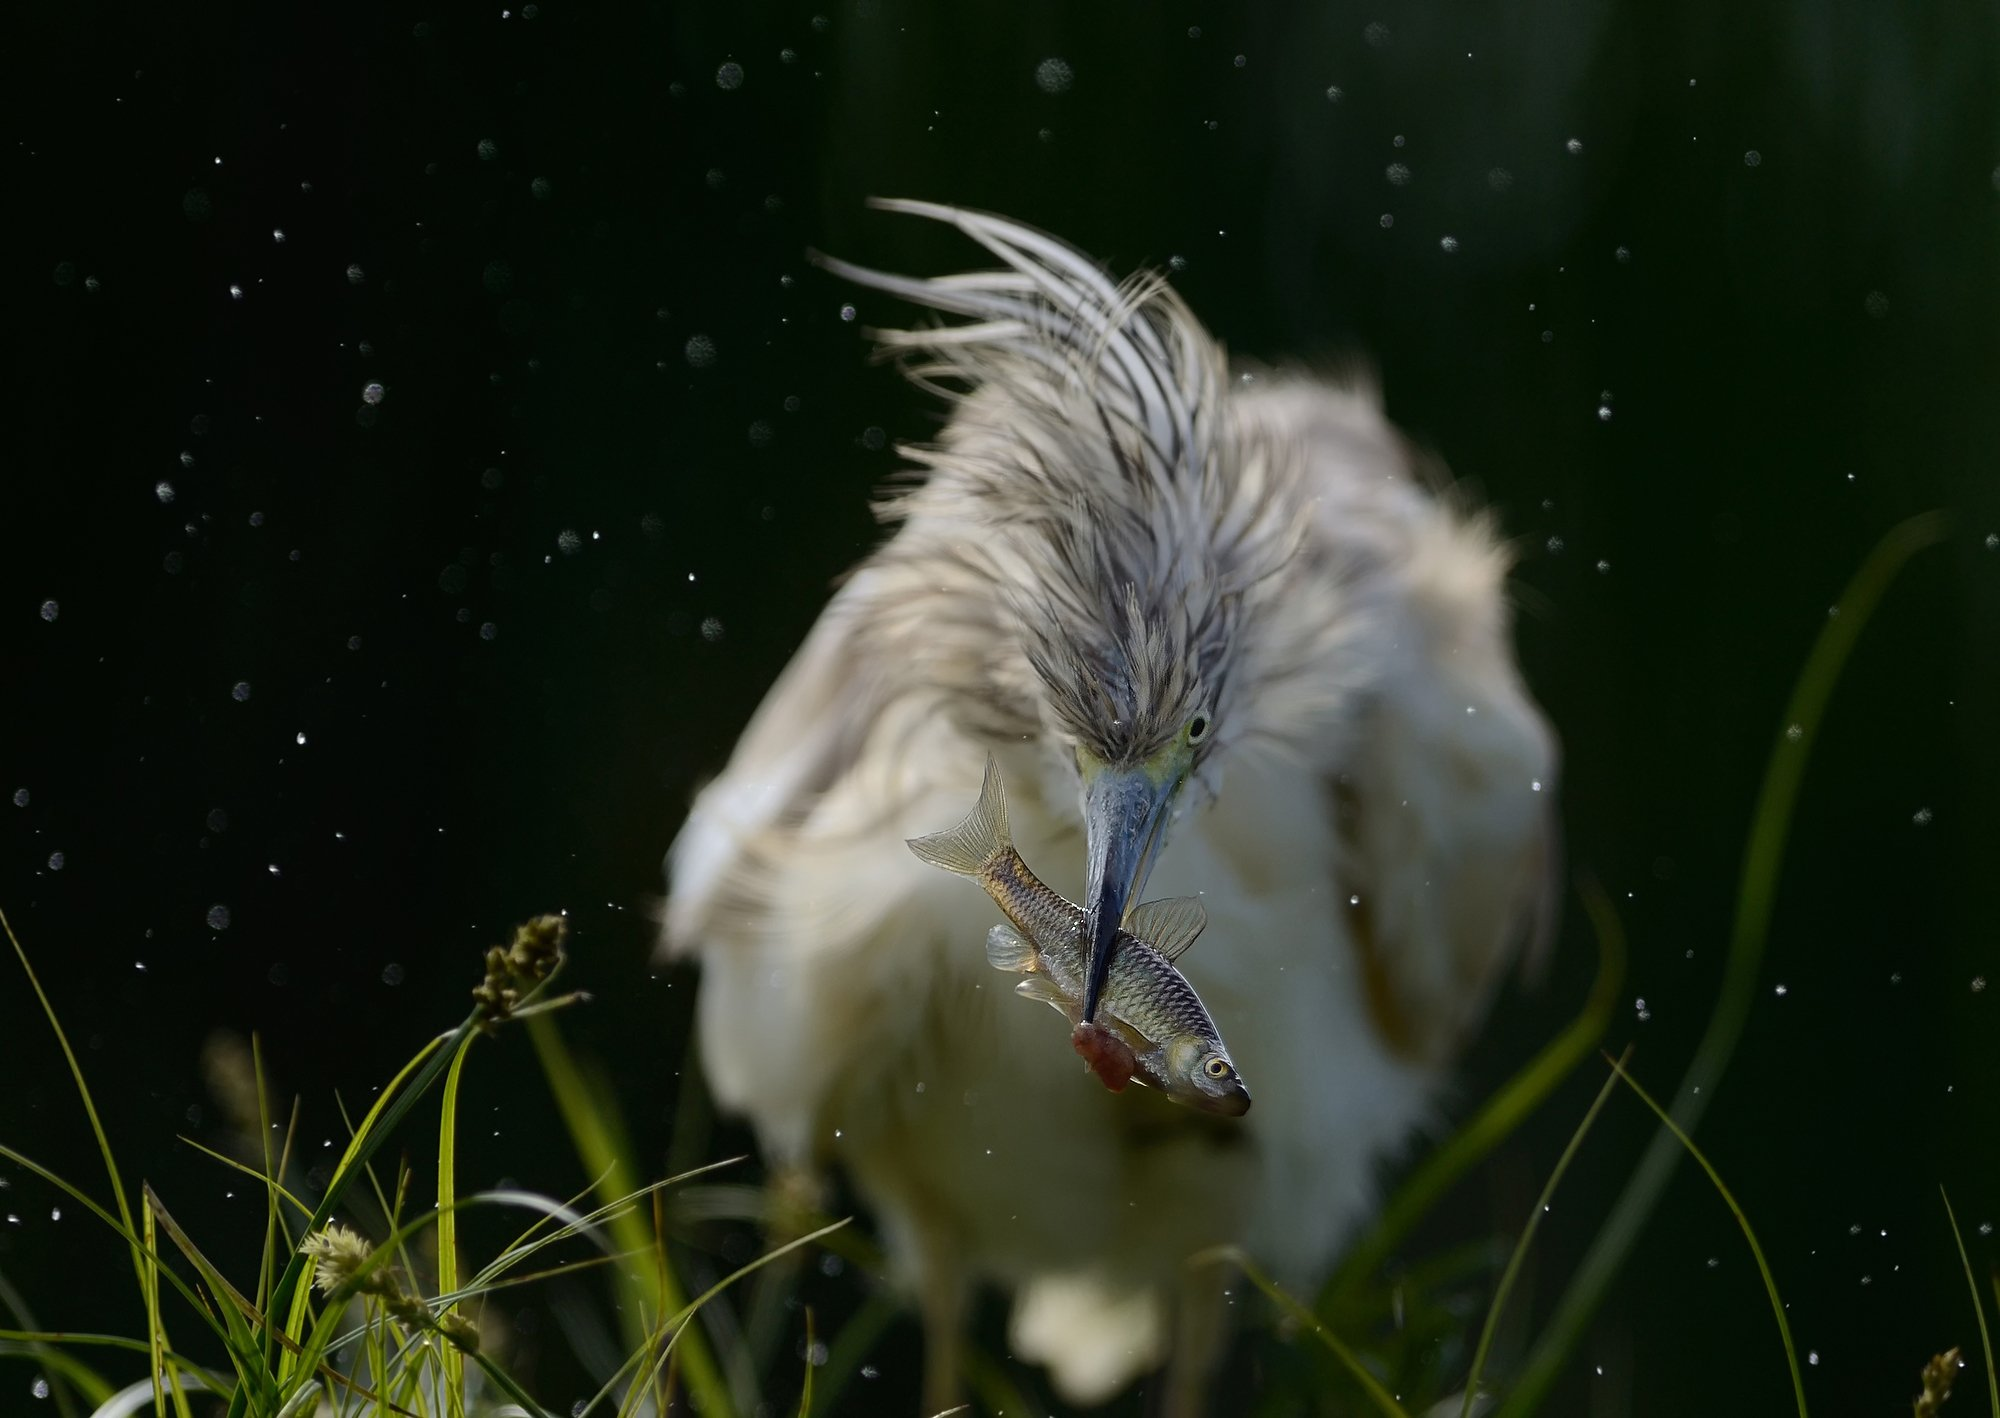 Heron, Жёлтая цапля, Radoslav Tsvetkov